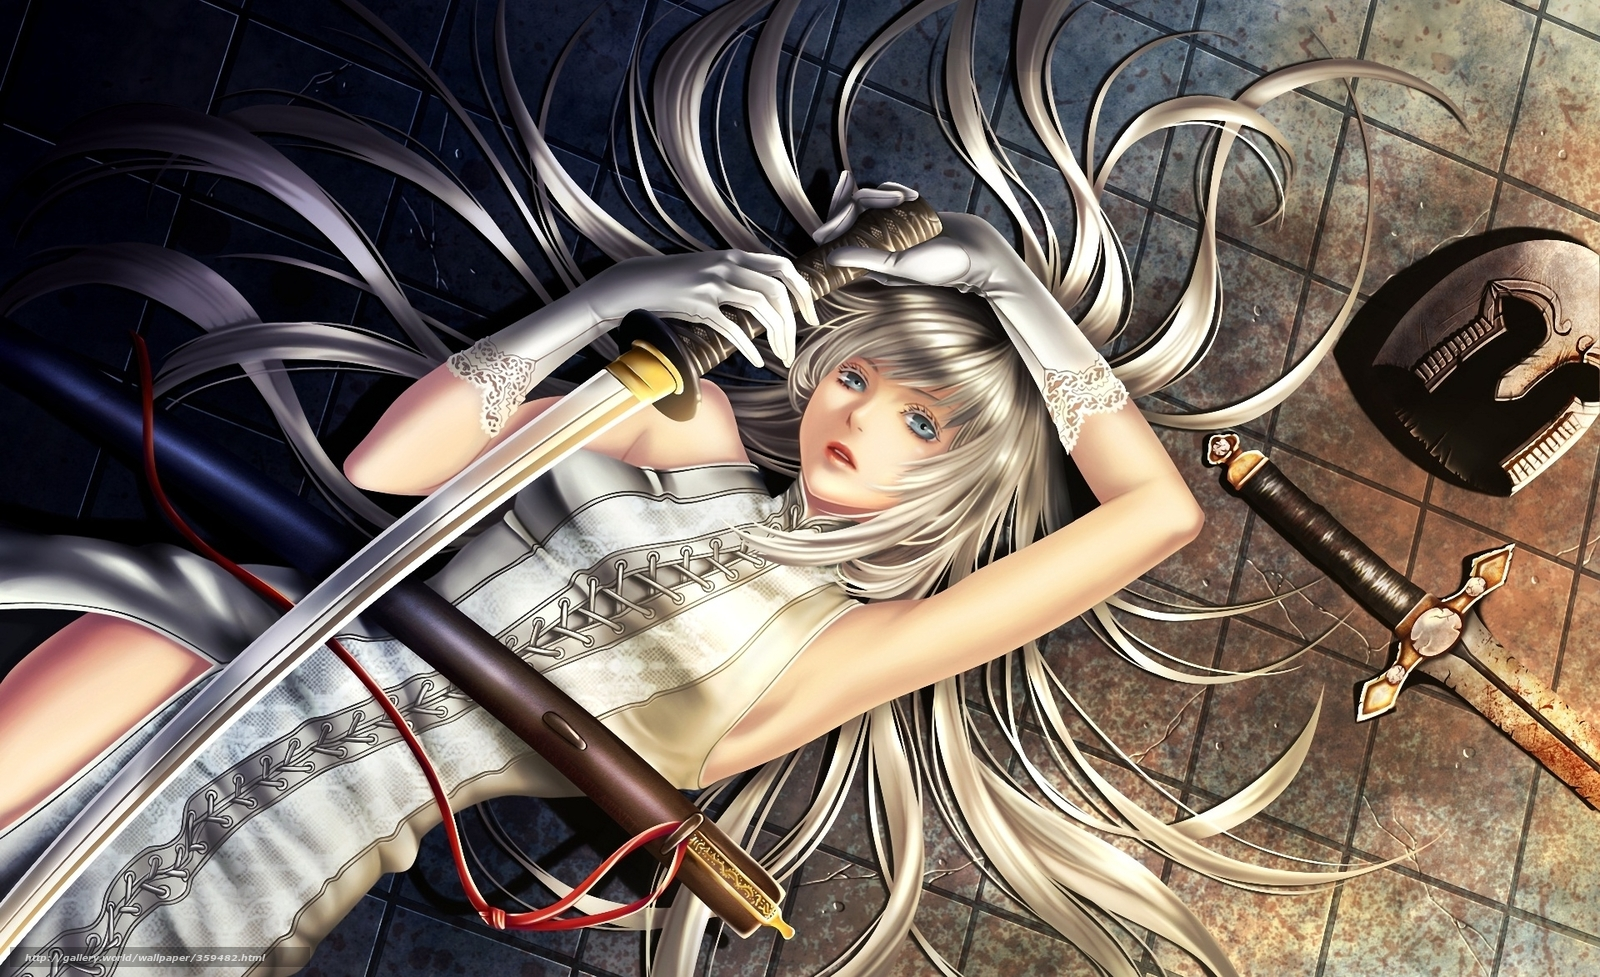 Download wallpaper Art,  girl,  sword,  Katana free desktop wallpaper in the resolution 1920x1172 — picture №359482